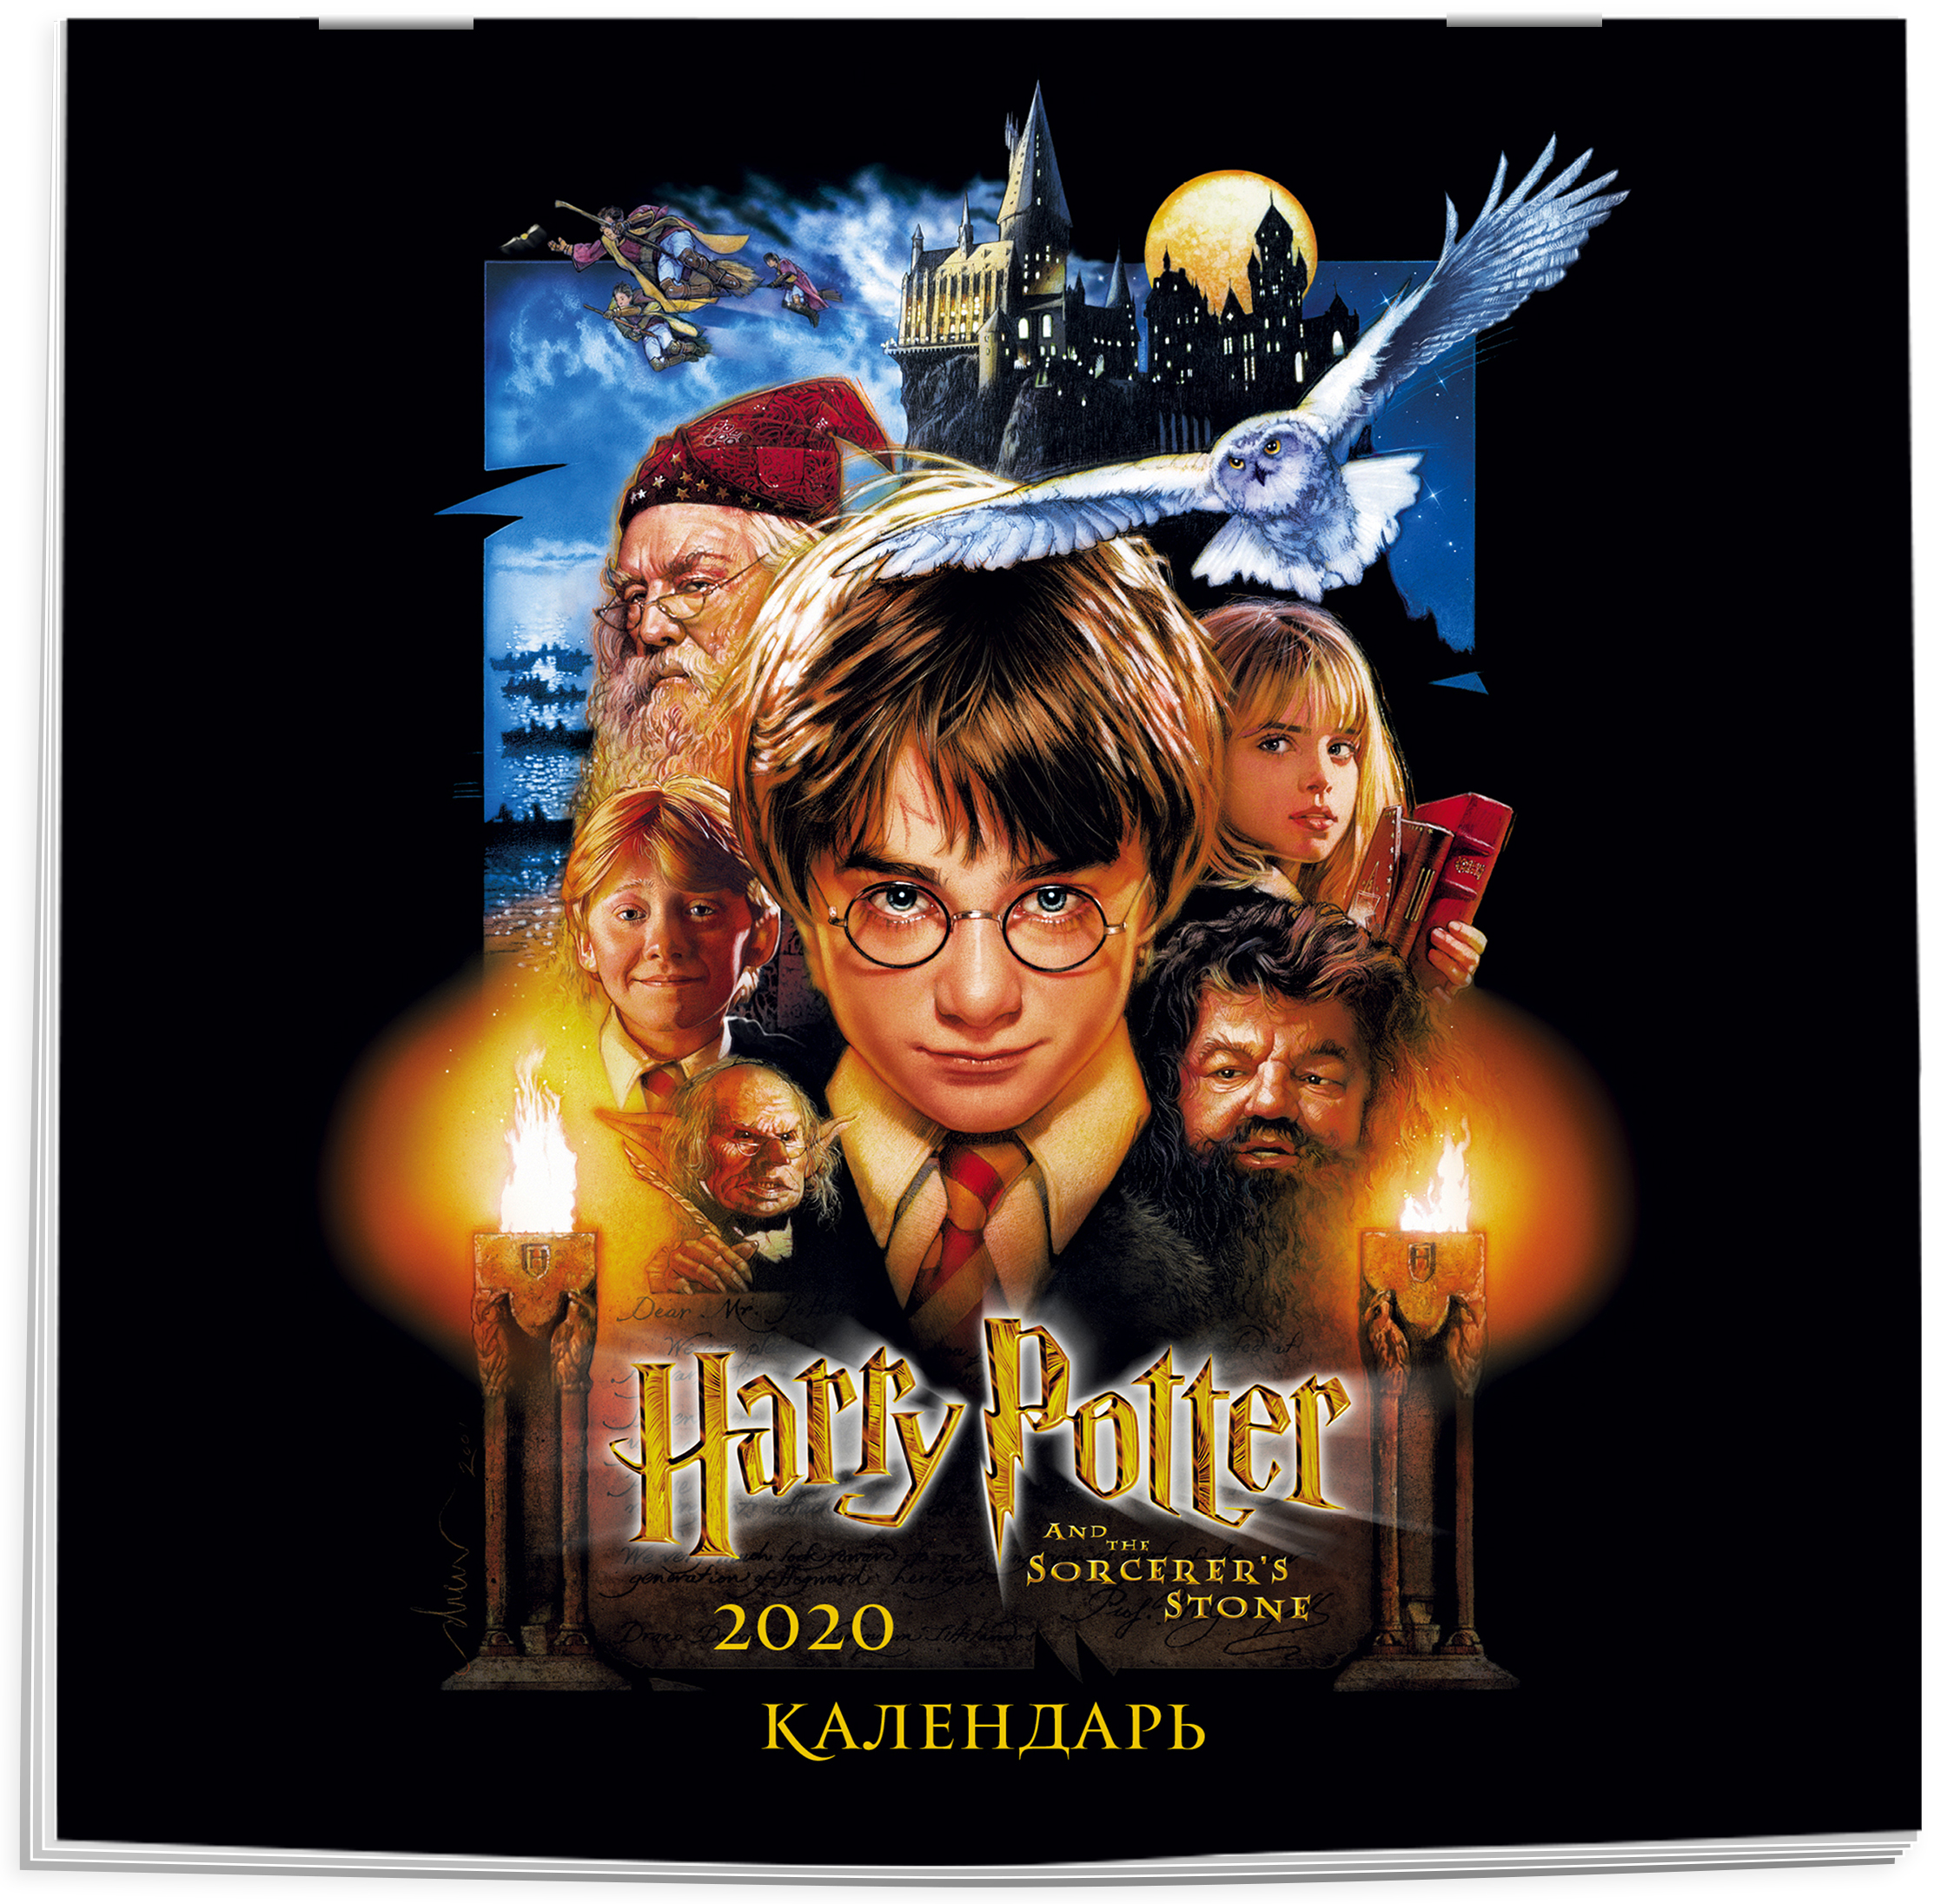 Гарри Поттер. Календарь настенный на 2020 год (170х170 мм) гарри поттер календарь настенный на 2019 год постер